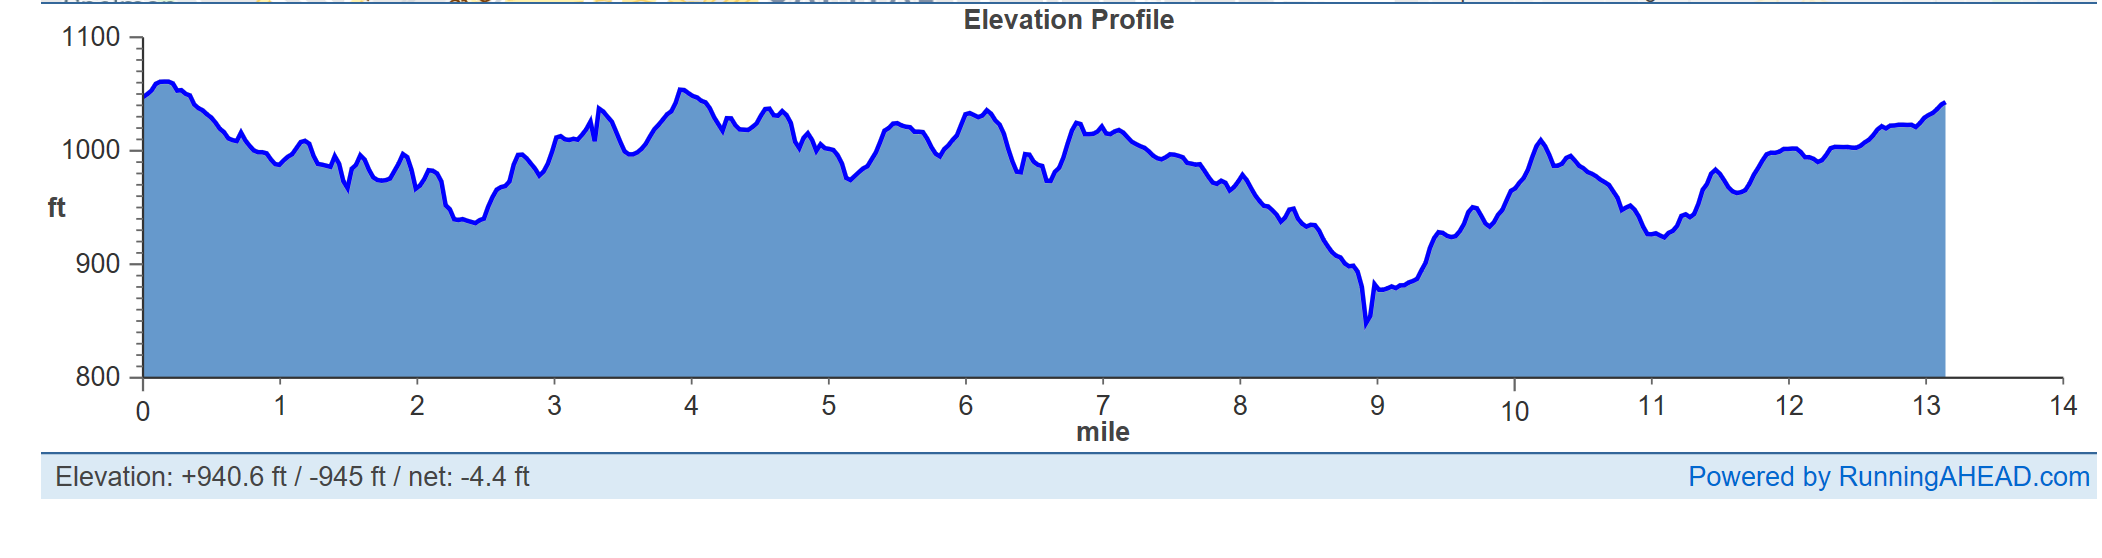 That hill at mile 9 was no joke ya'll.